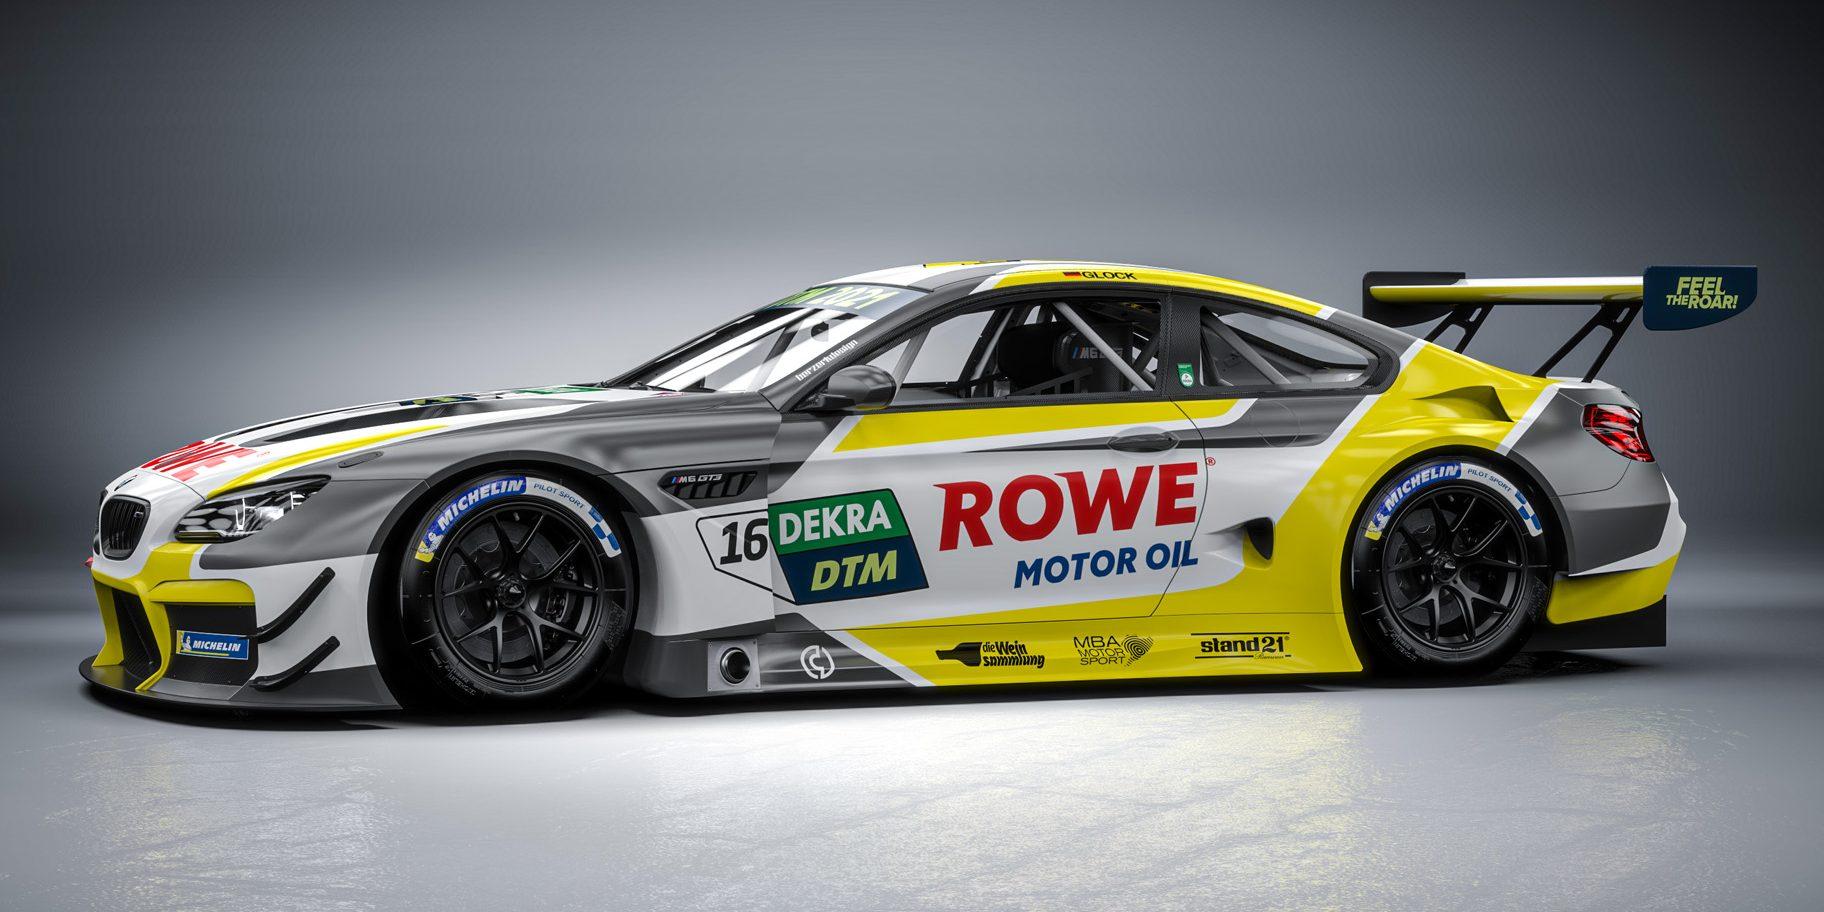 ROWE RACING verpflichtet Publikumsliebling Timo Glock für ...